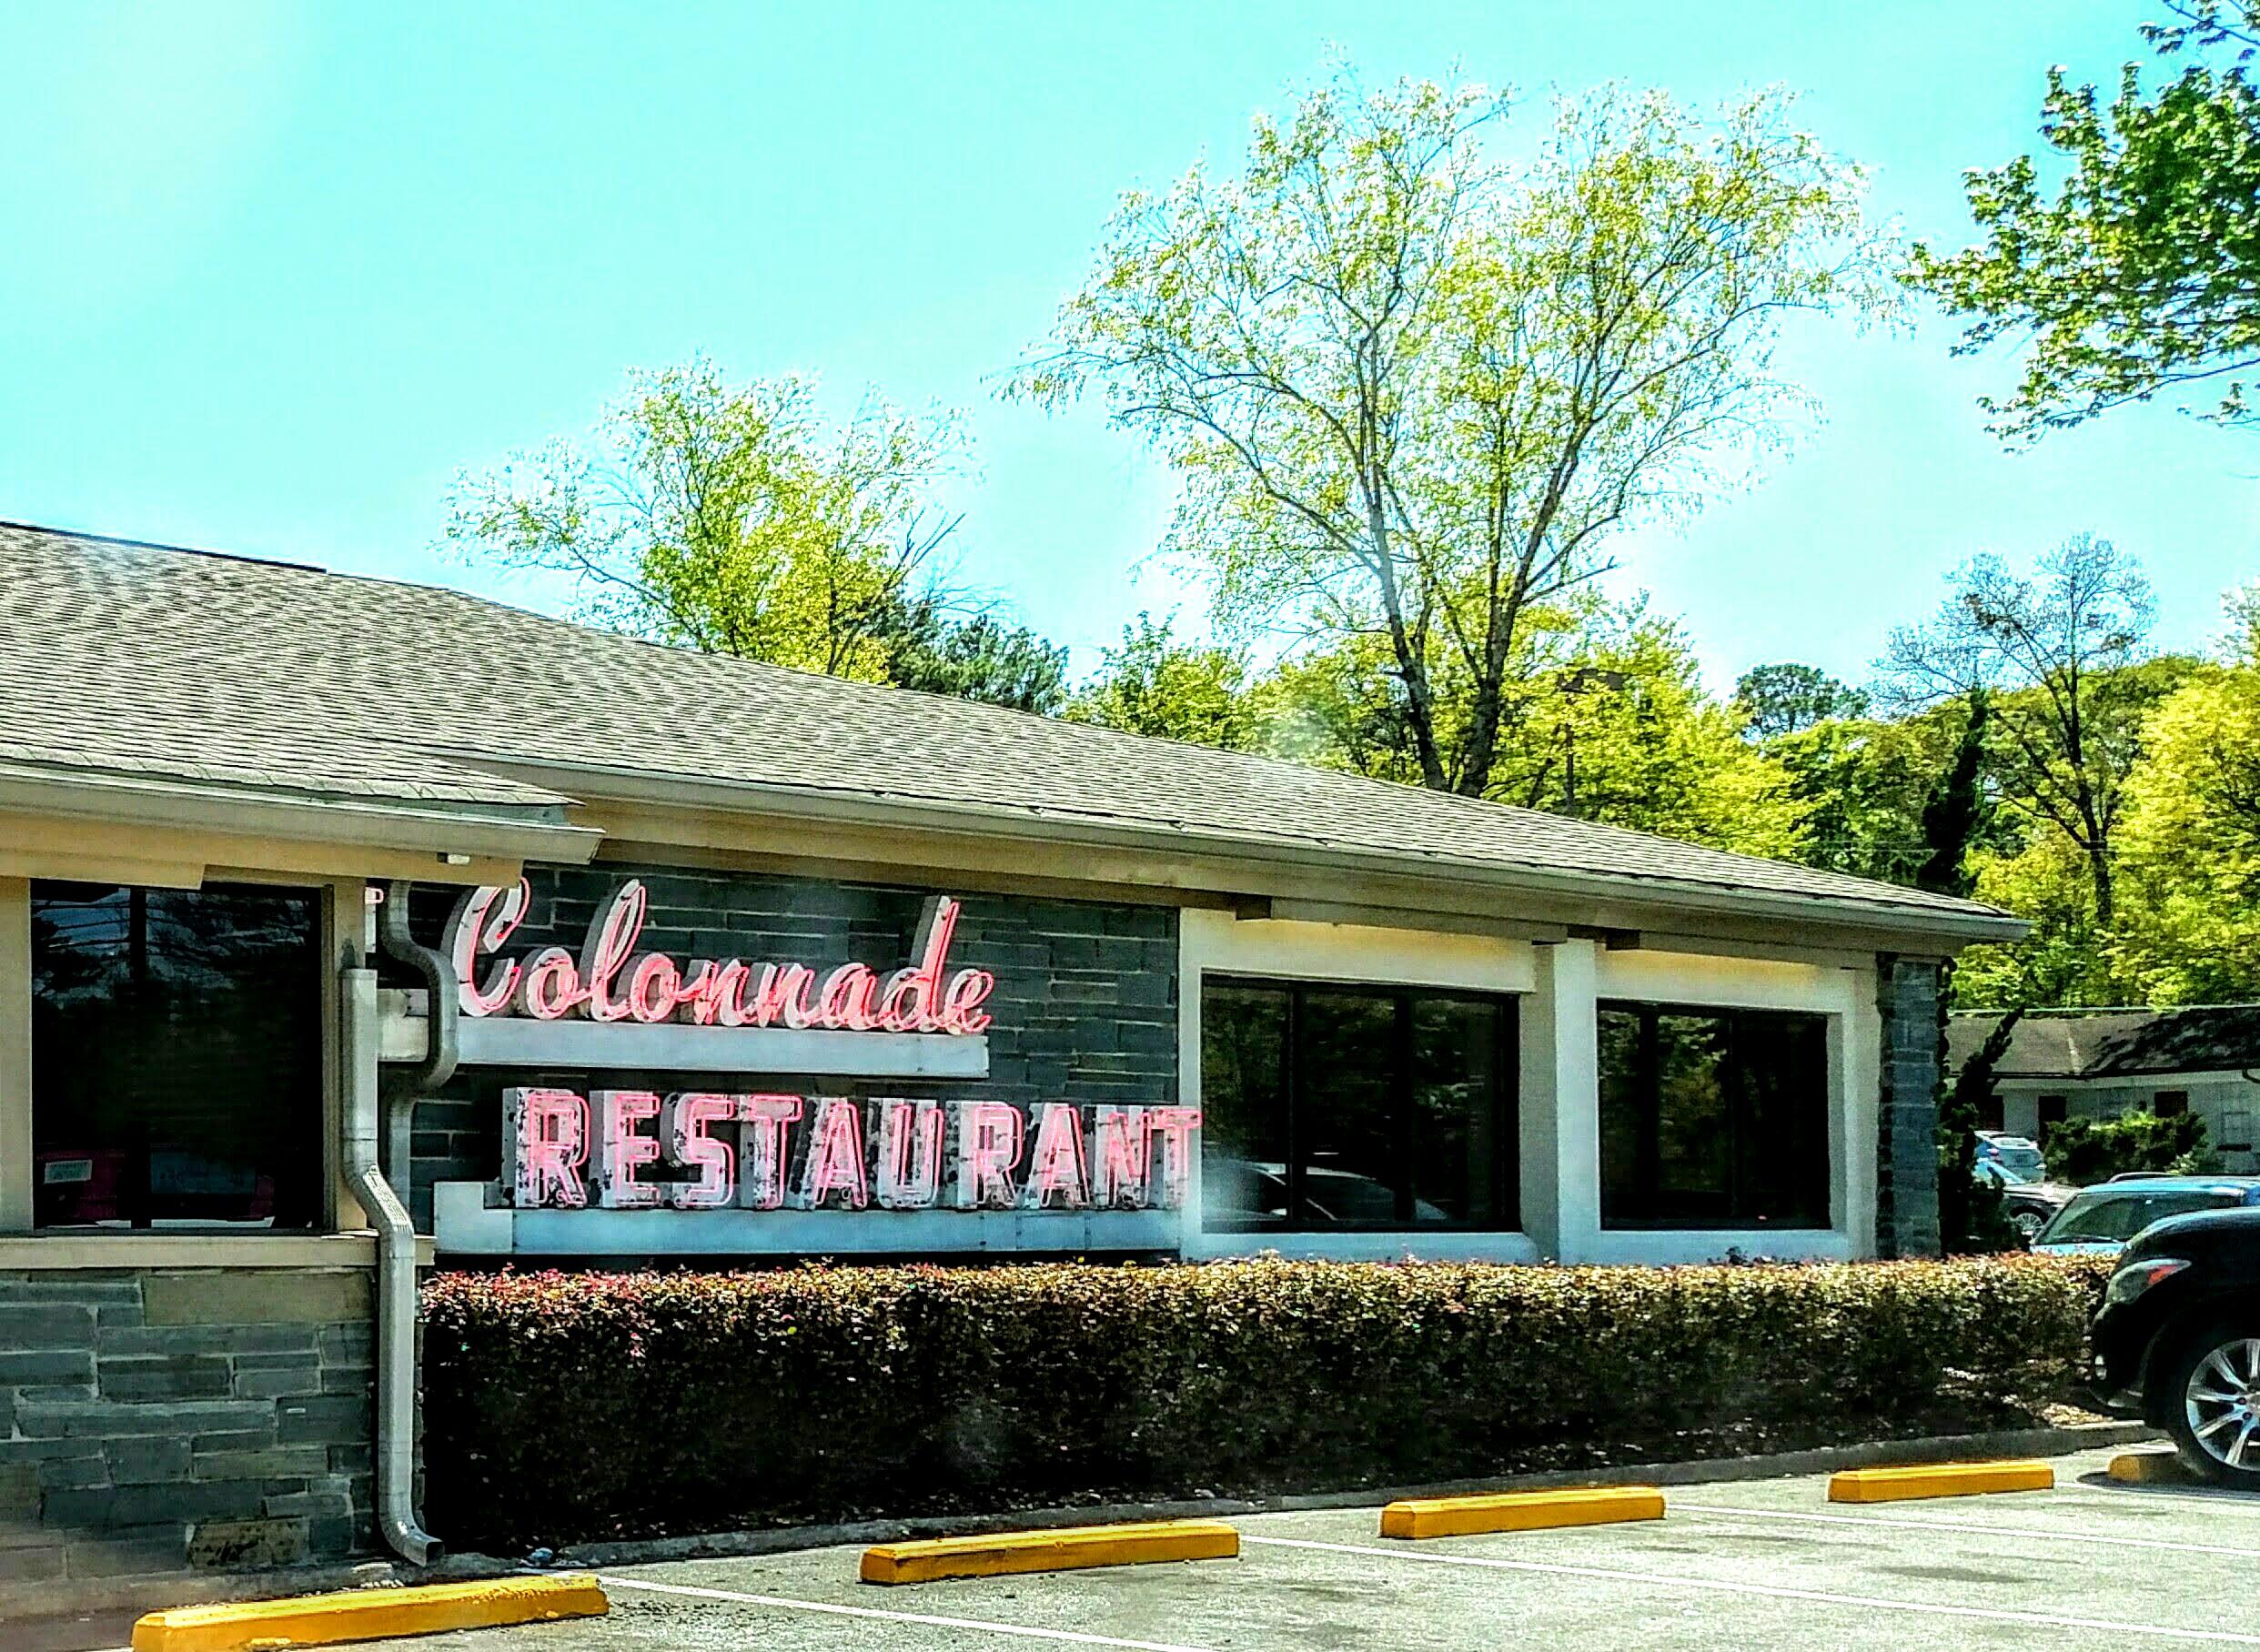 The Colonnade Restaurant - Atlanta   Restaurant Review - Zagat